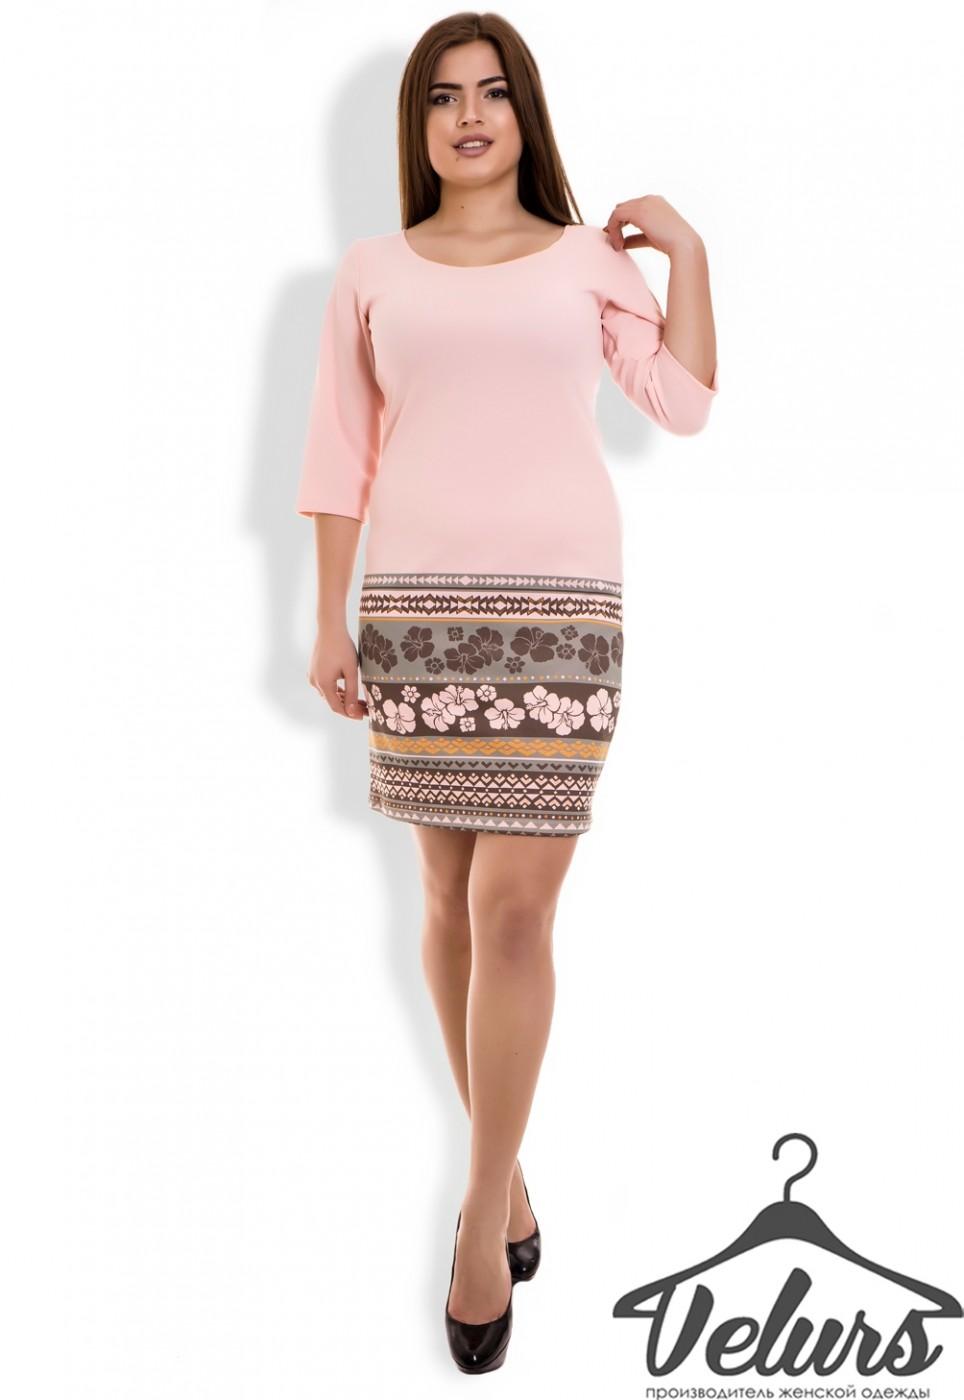 Velurs: Платье 212130 - фото 10